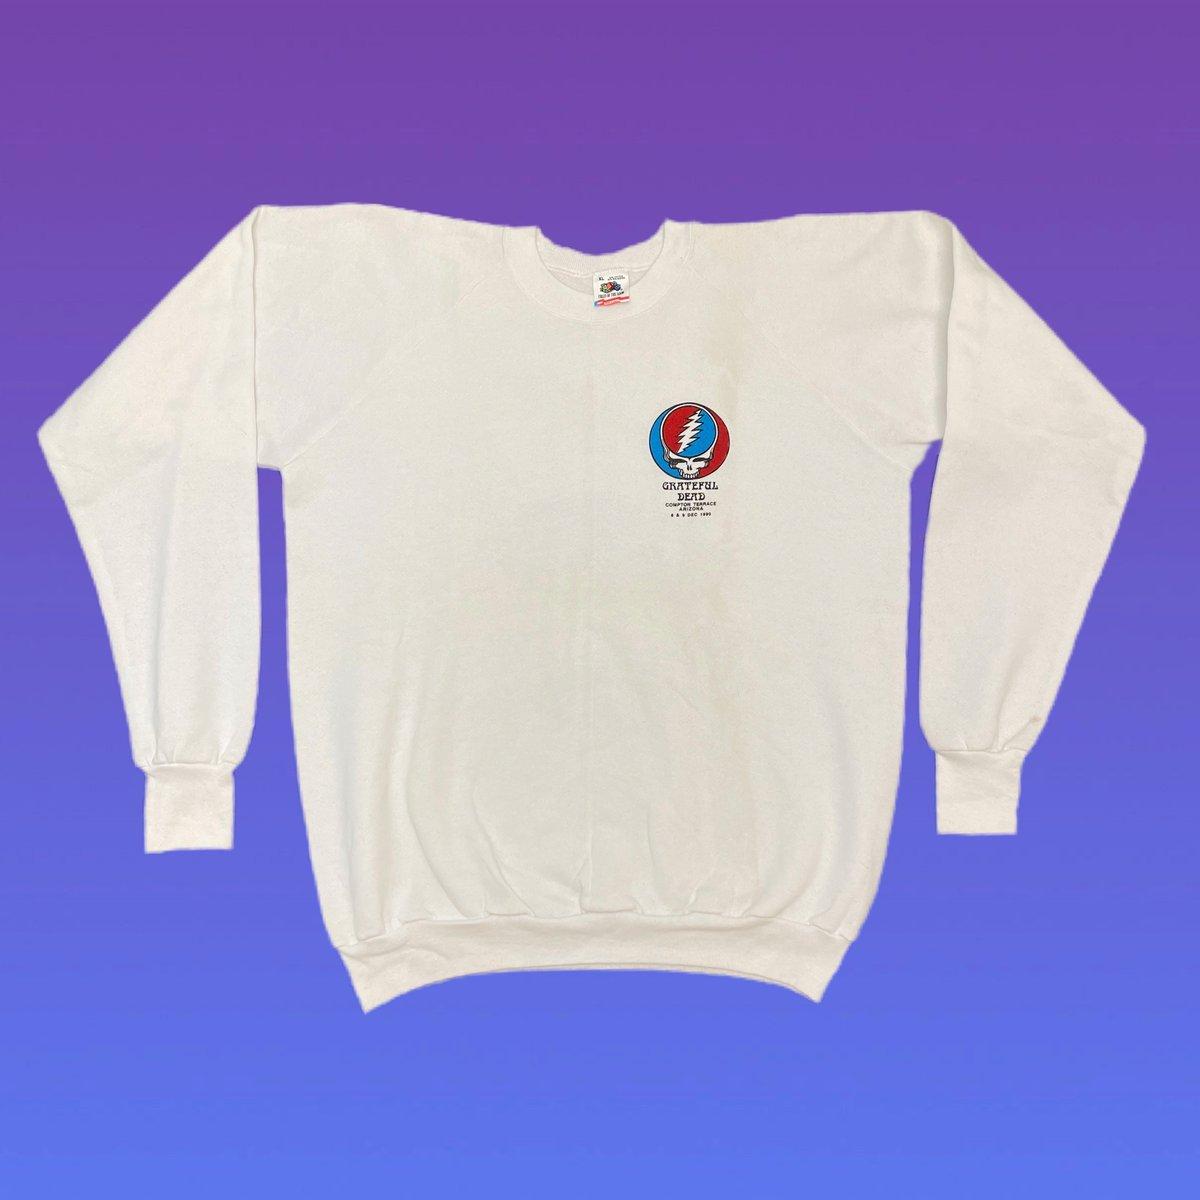 Original Vintage Grateful Dead / Crew 1990 Long Sleeve Crewneck Sweatshirt! X-LARGE